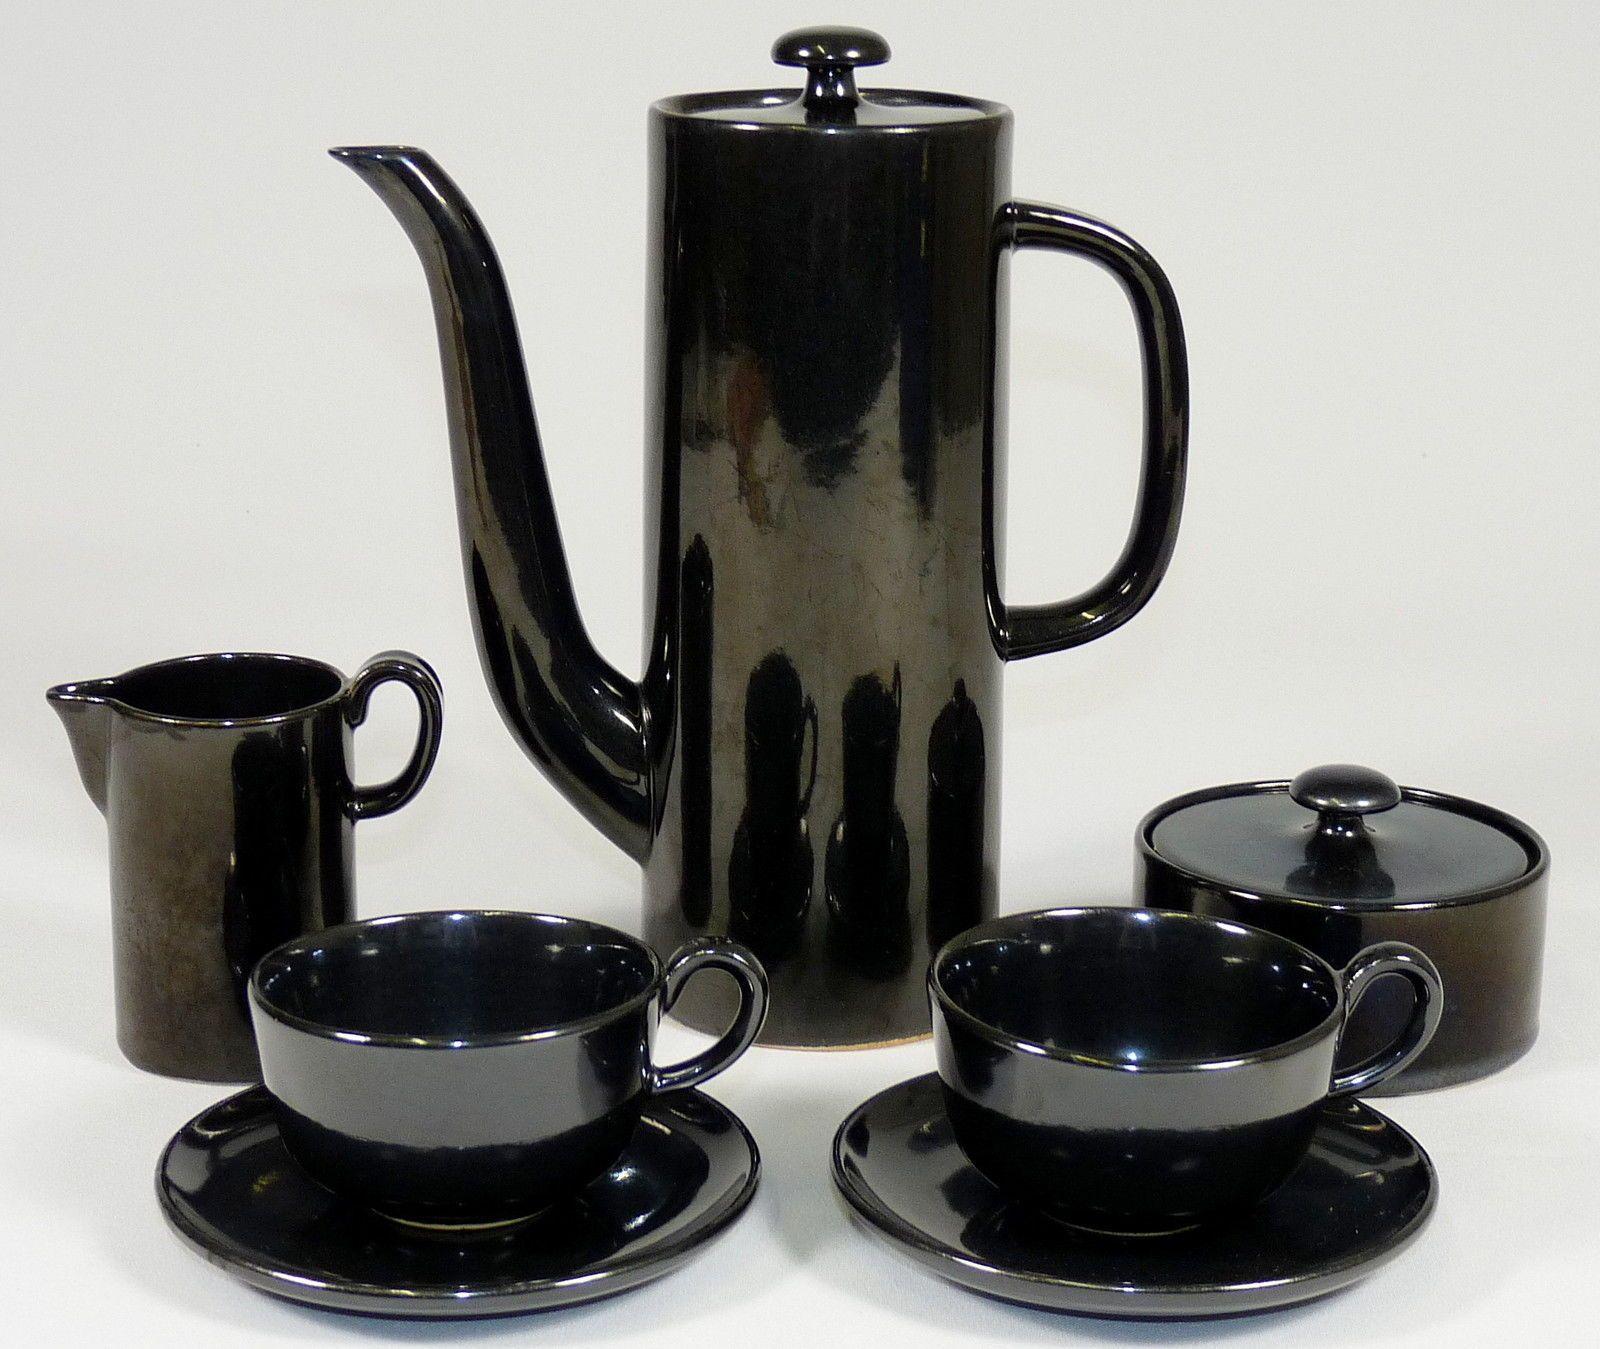 hedwig bollhagen hb ddr porcelain pinterest produktdesign tipps und tricks und keramik. Black Bedroom Furniture Sets. Home Design Ideas